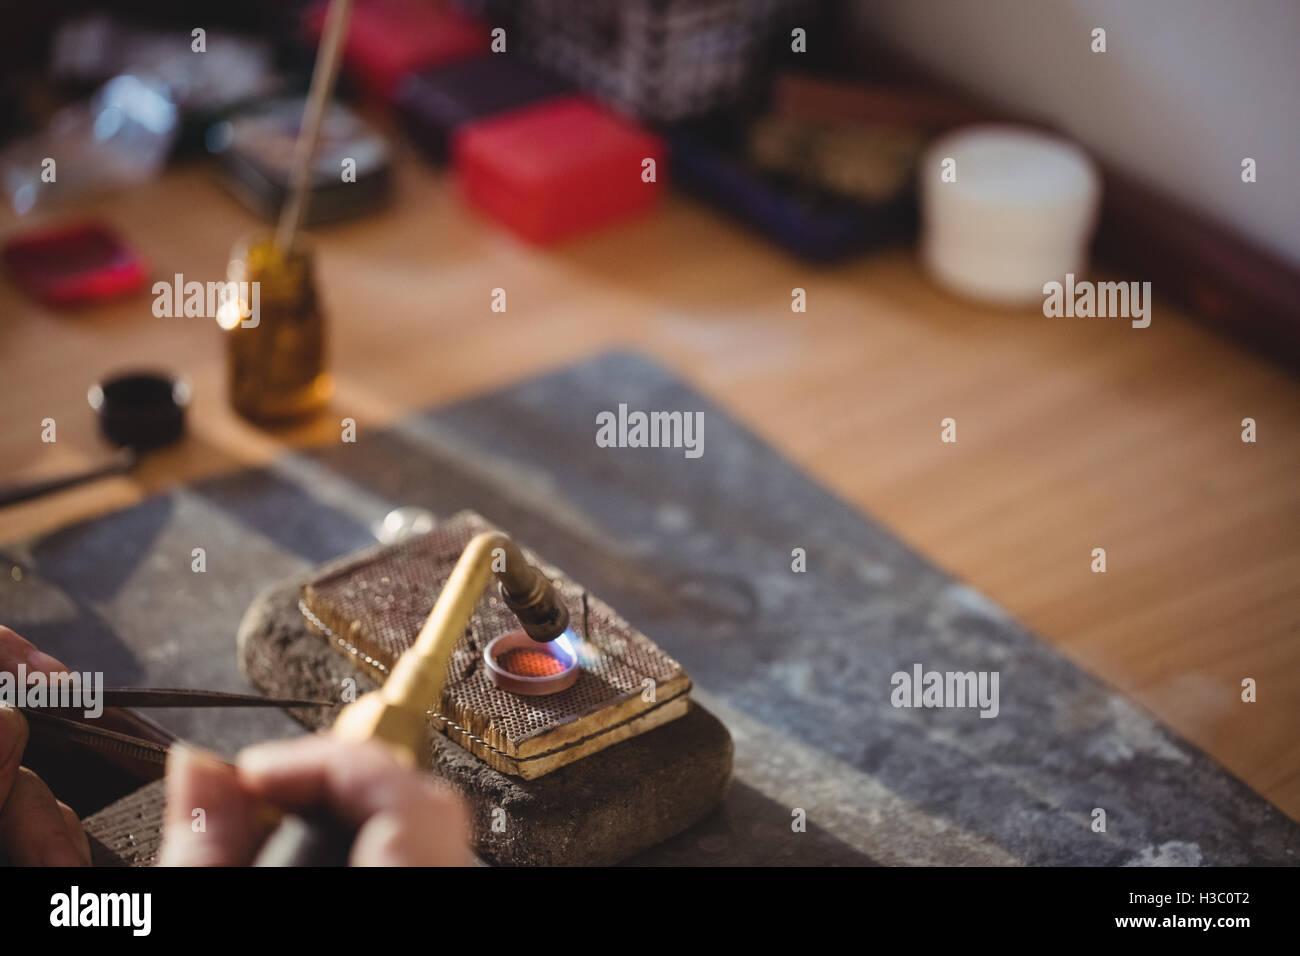 Goldsmith crafting ring by burner Stock Photo